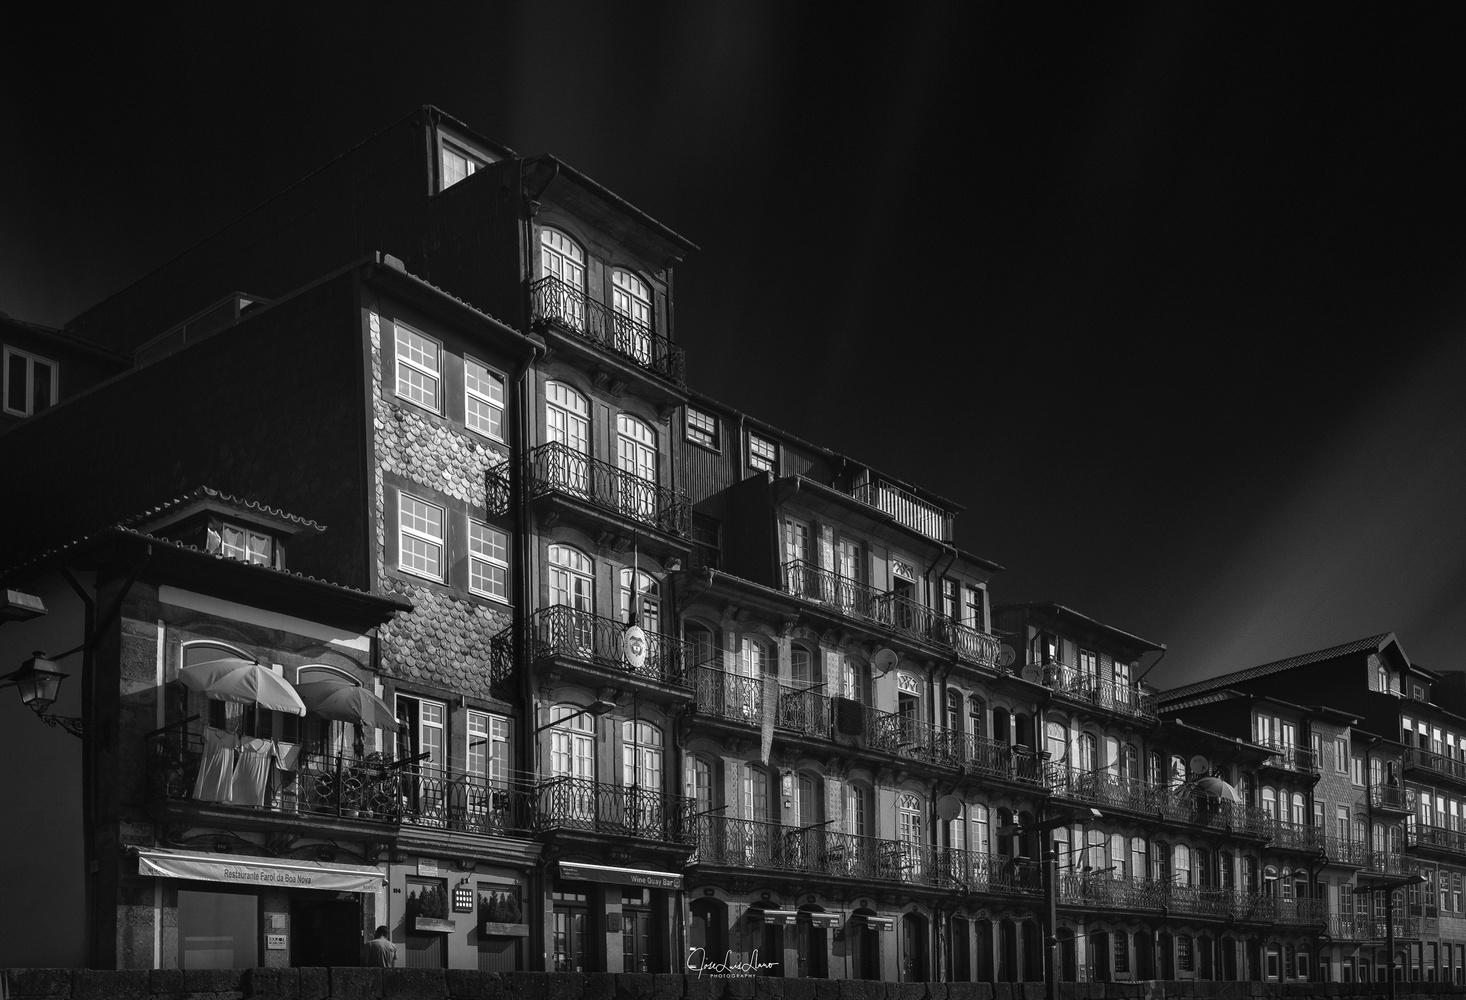 Oporto in black by Jose Luis Llano